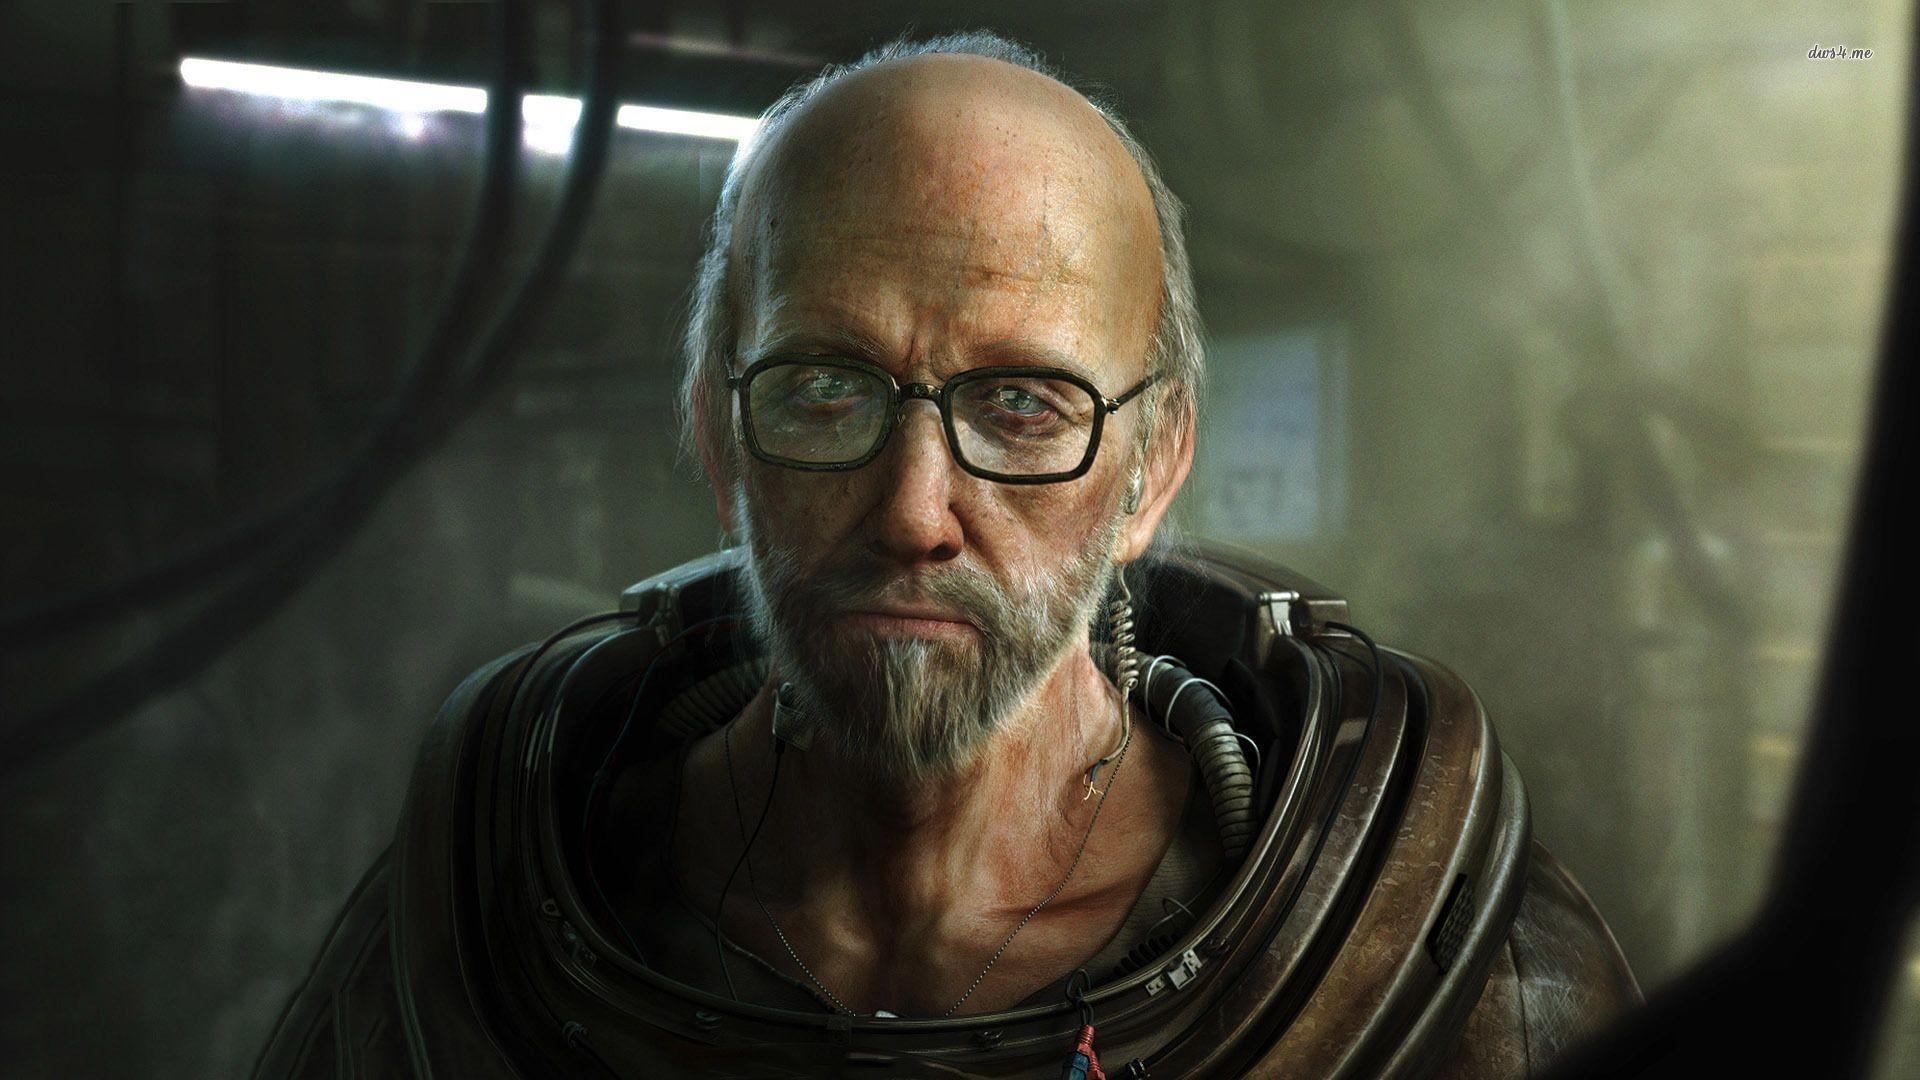 Gordon Freeman – Half-Life wallpaper – Game wallpapers – #36745